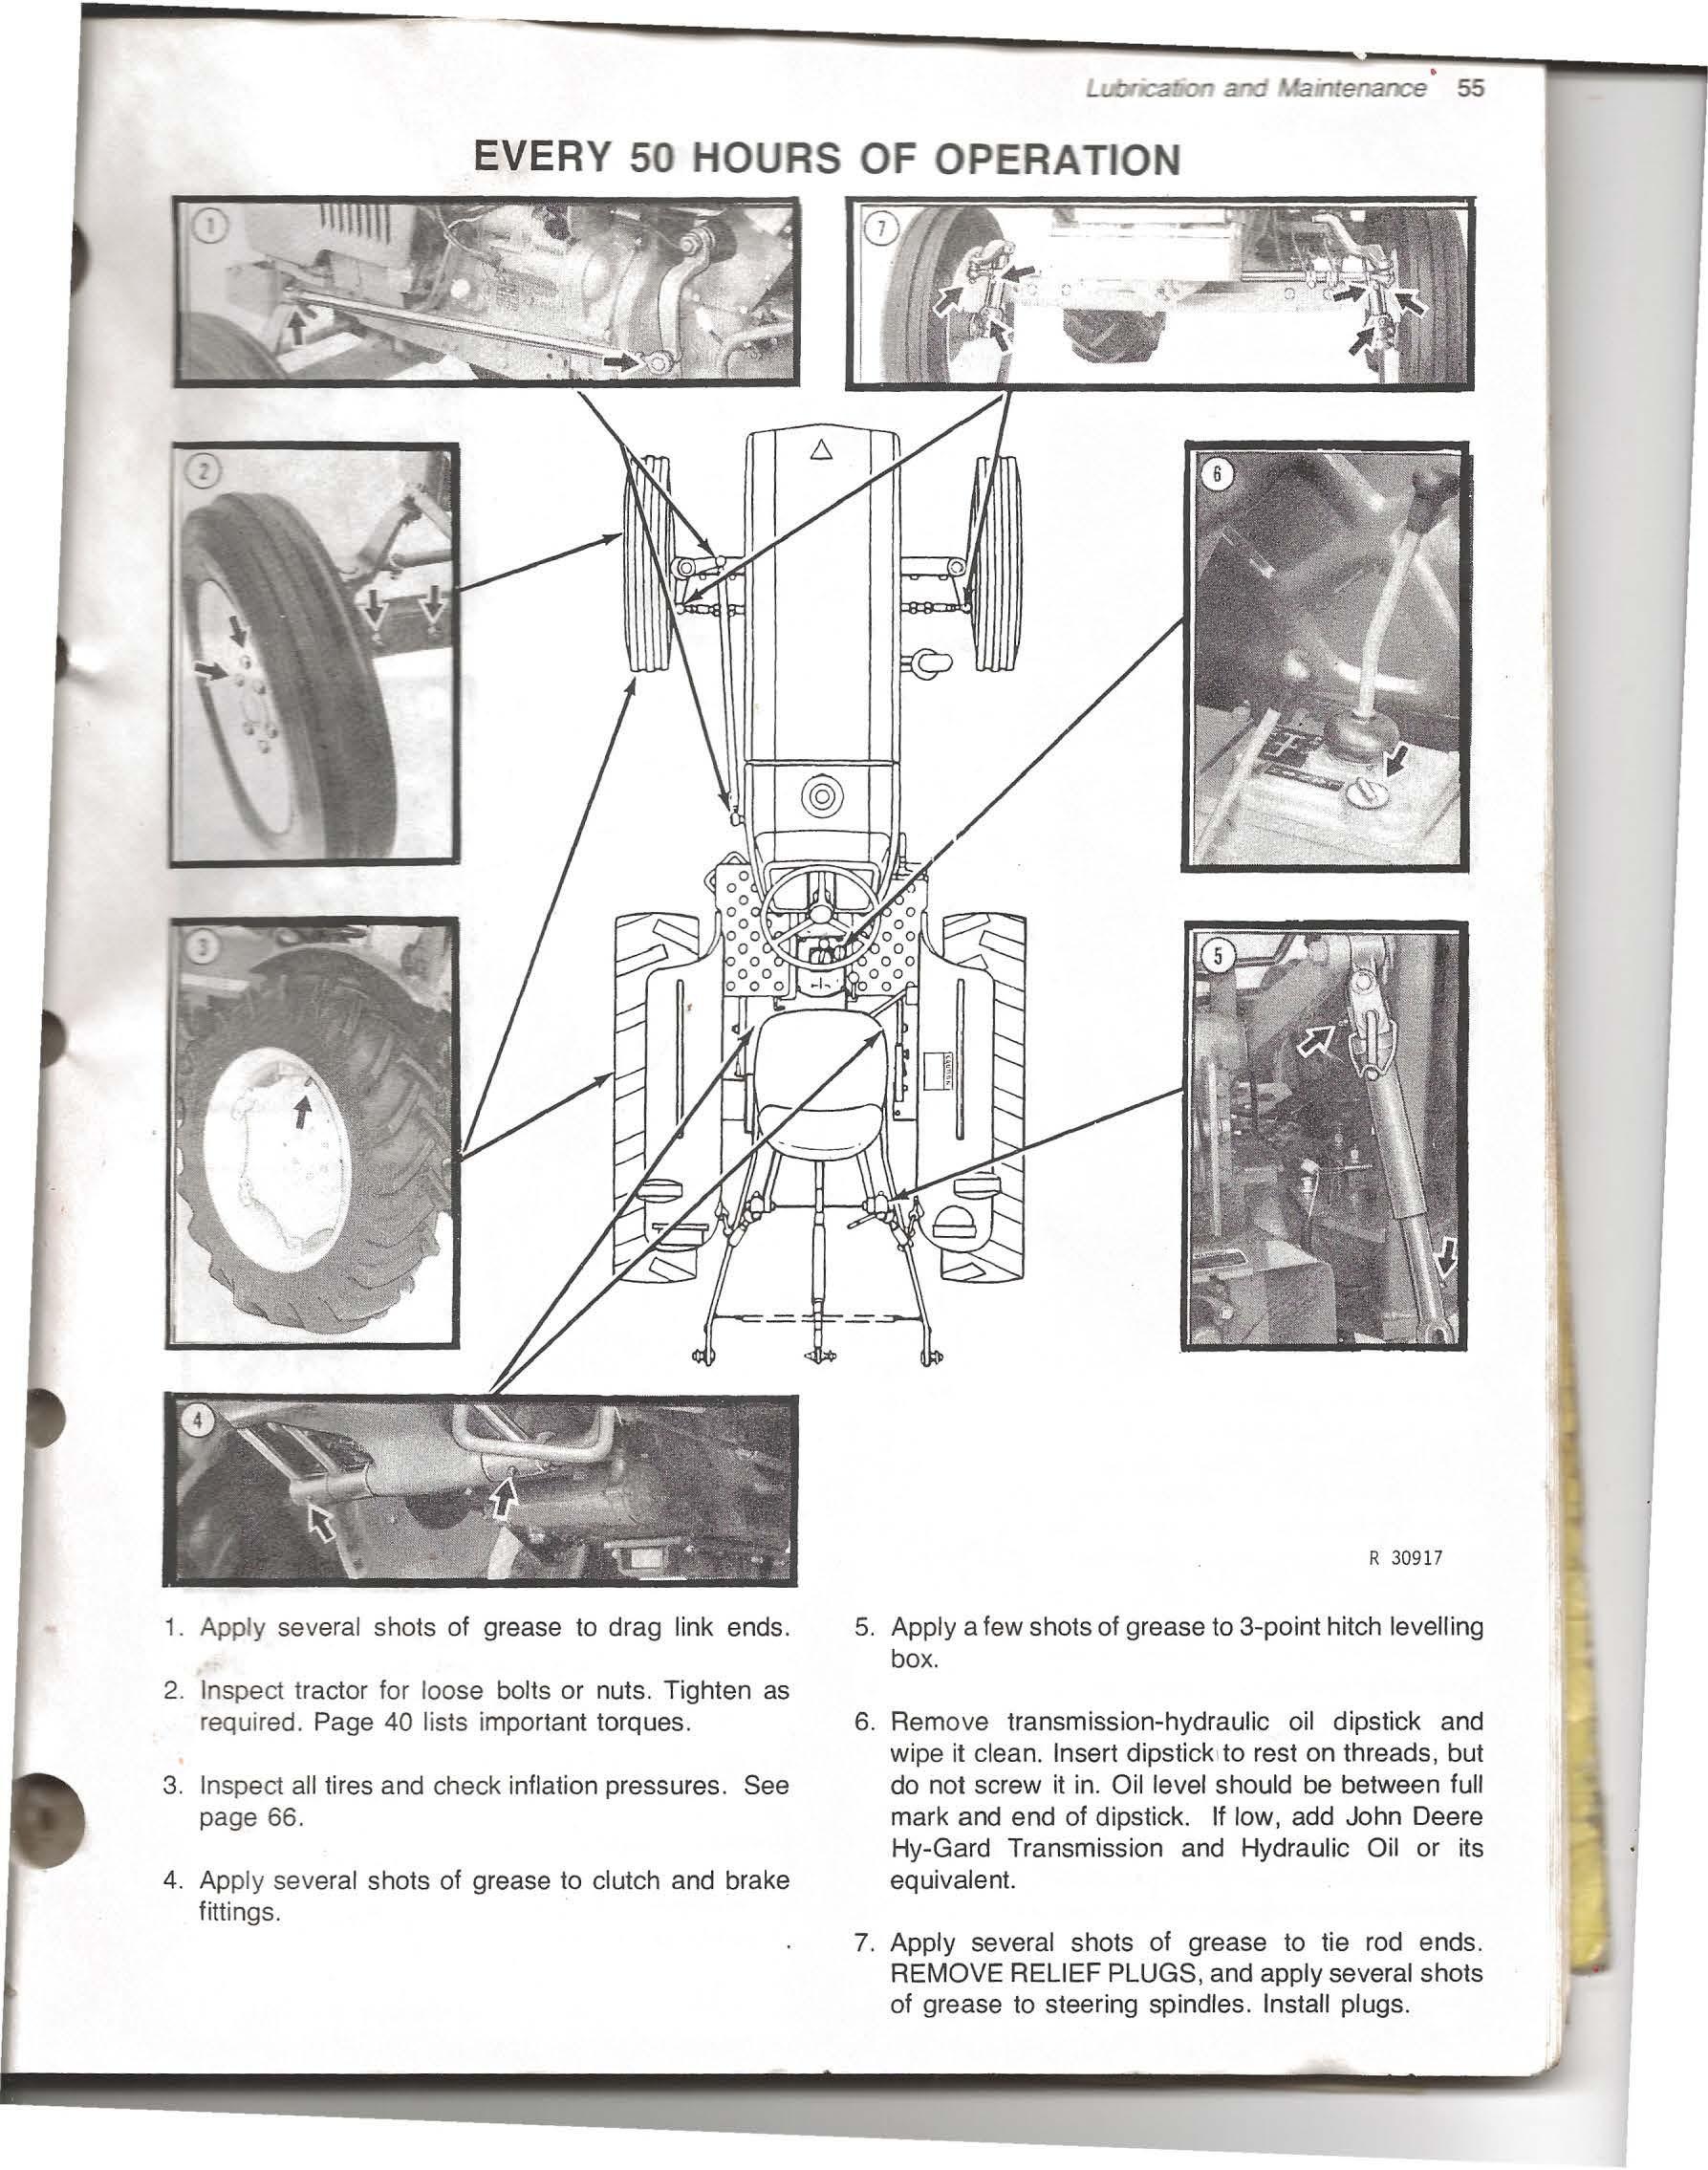 Fancy John Deere 50 Wiring Diagram Gallery - Everything You Need to ...